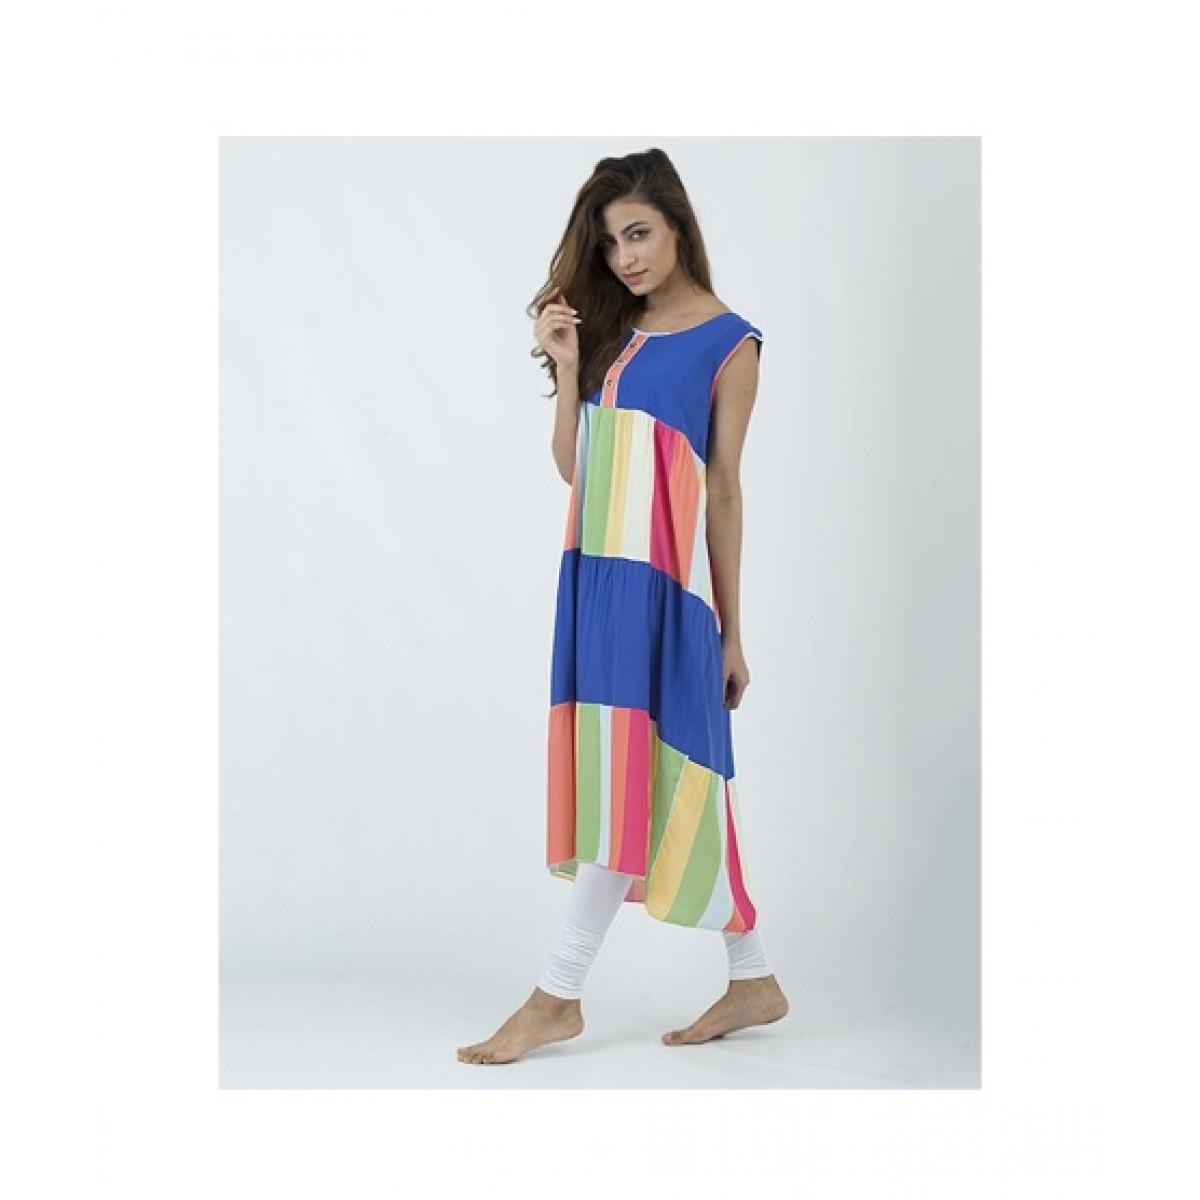 Asaan Buy Cotton Floral Print Sleeveless Night T-Shirt For Women - Blue